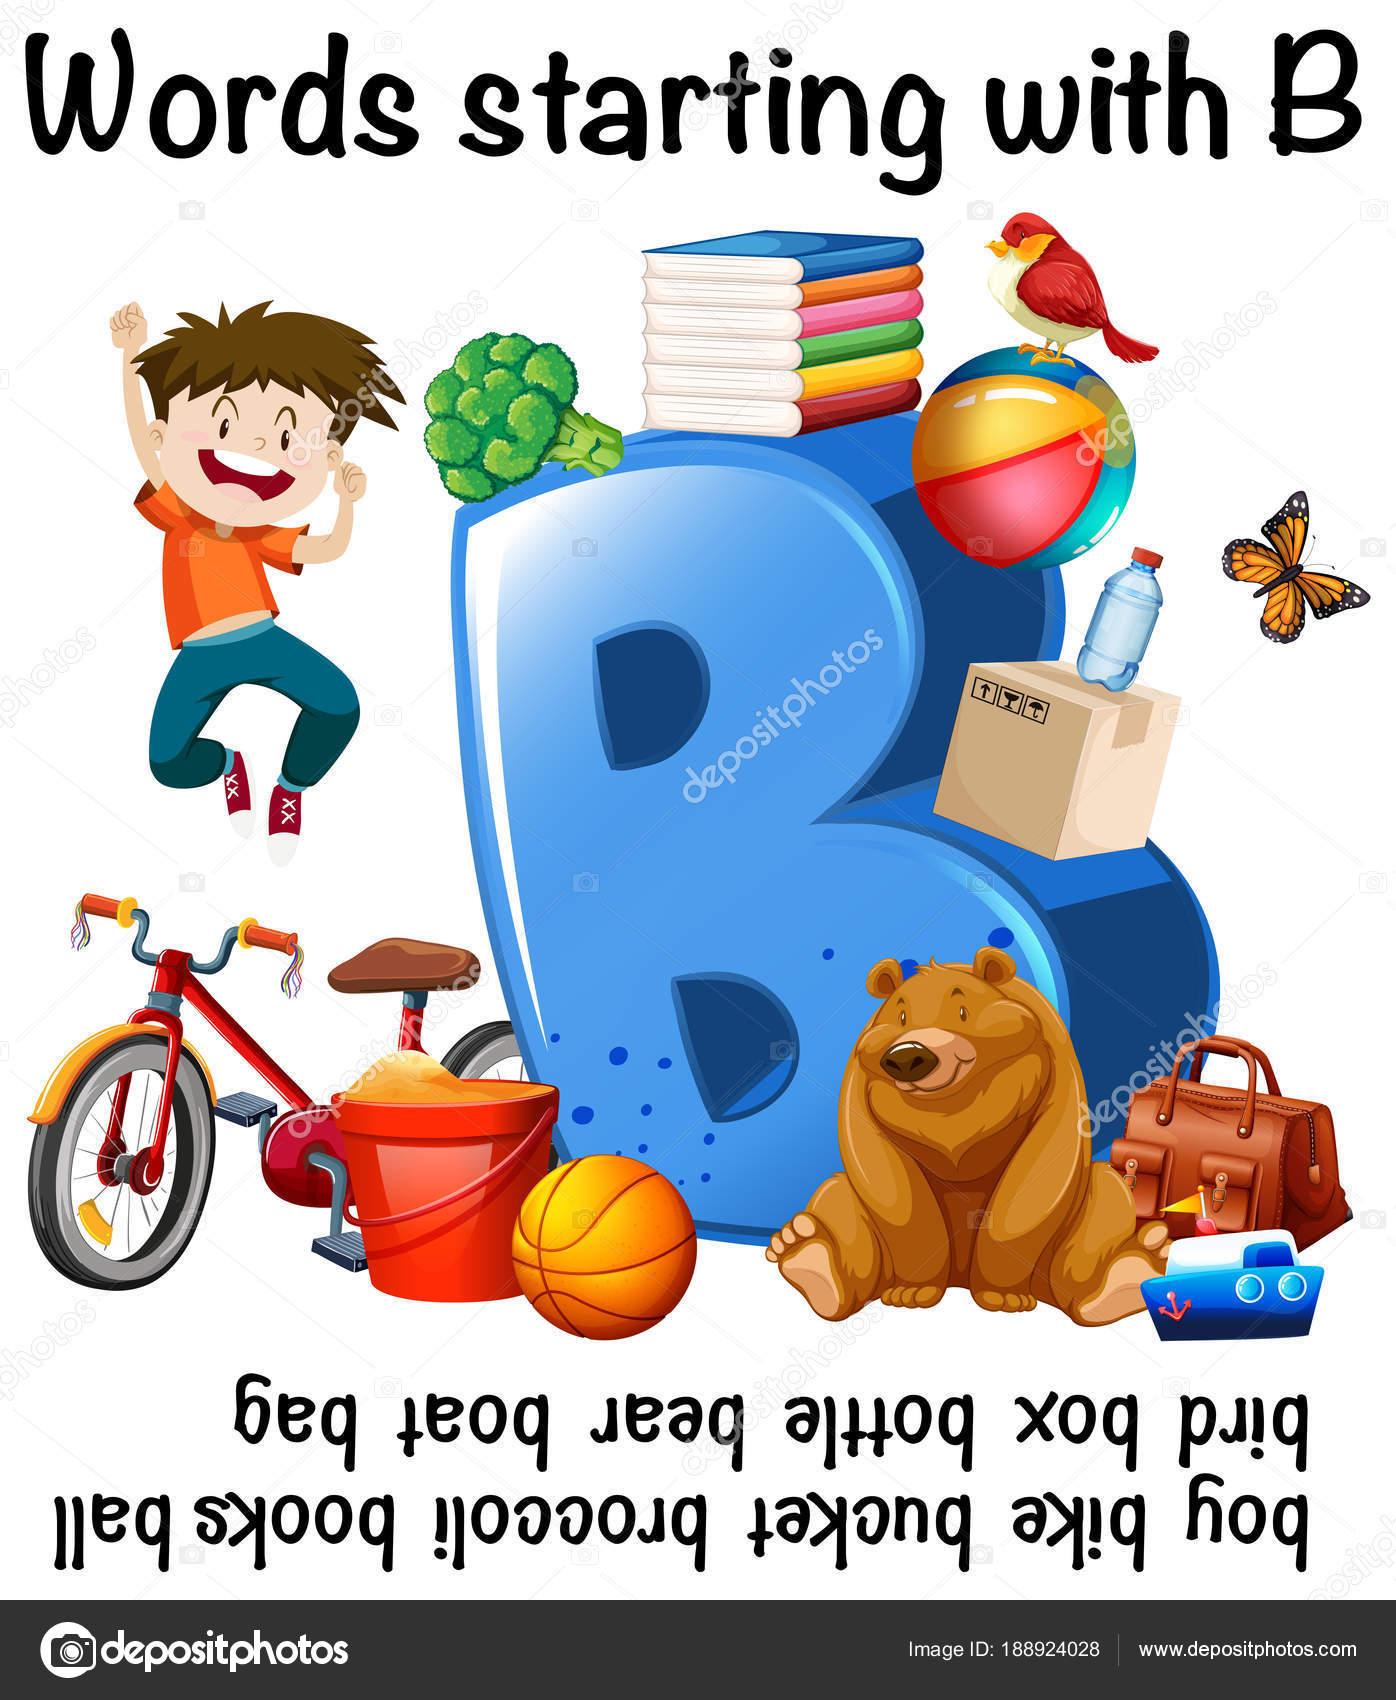 Arbeitsblatt-Design für Wörter beginnend mit B — Stockvektor ...